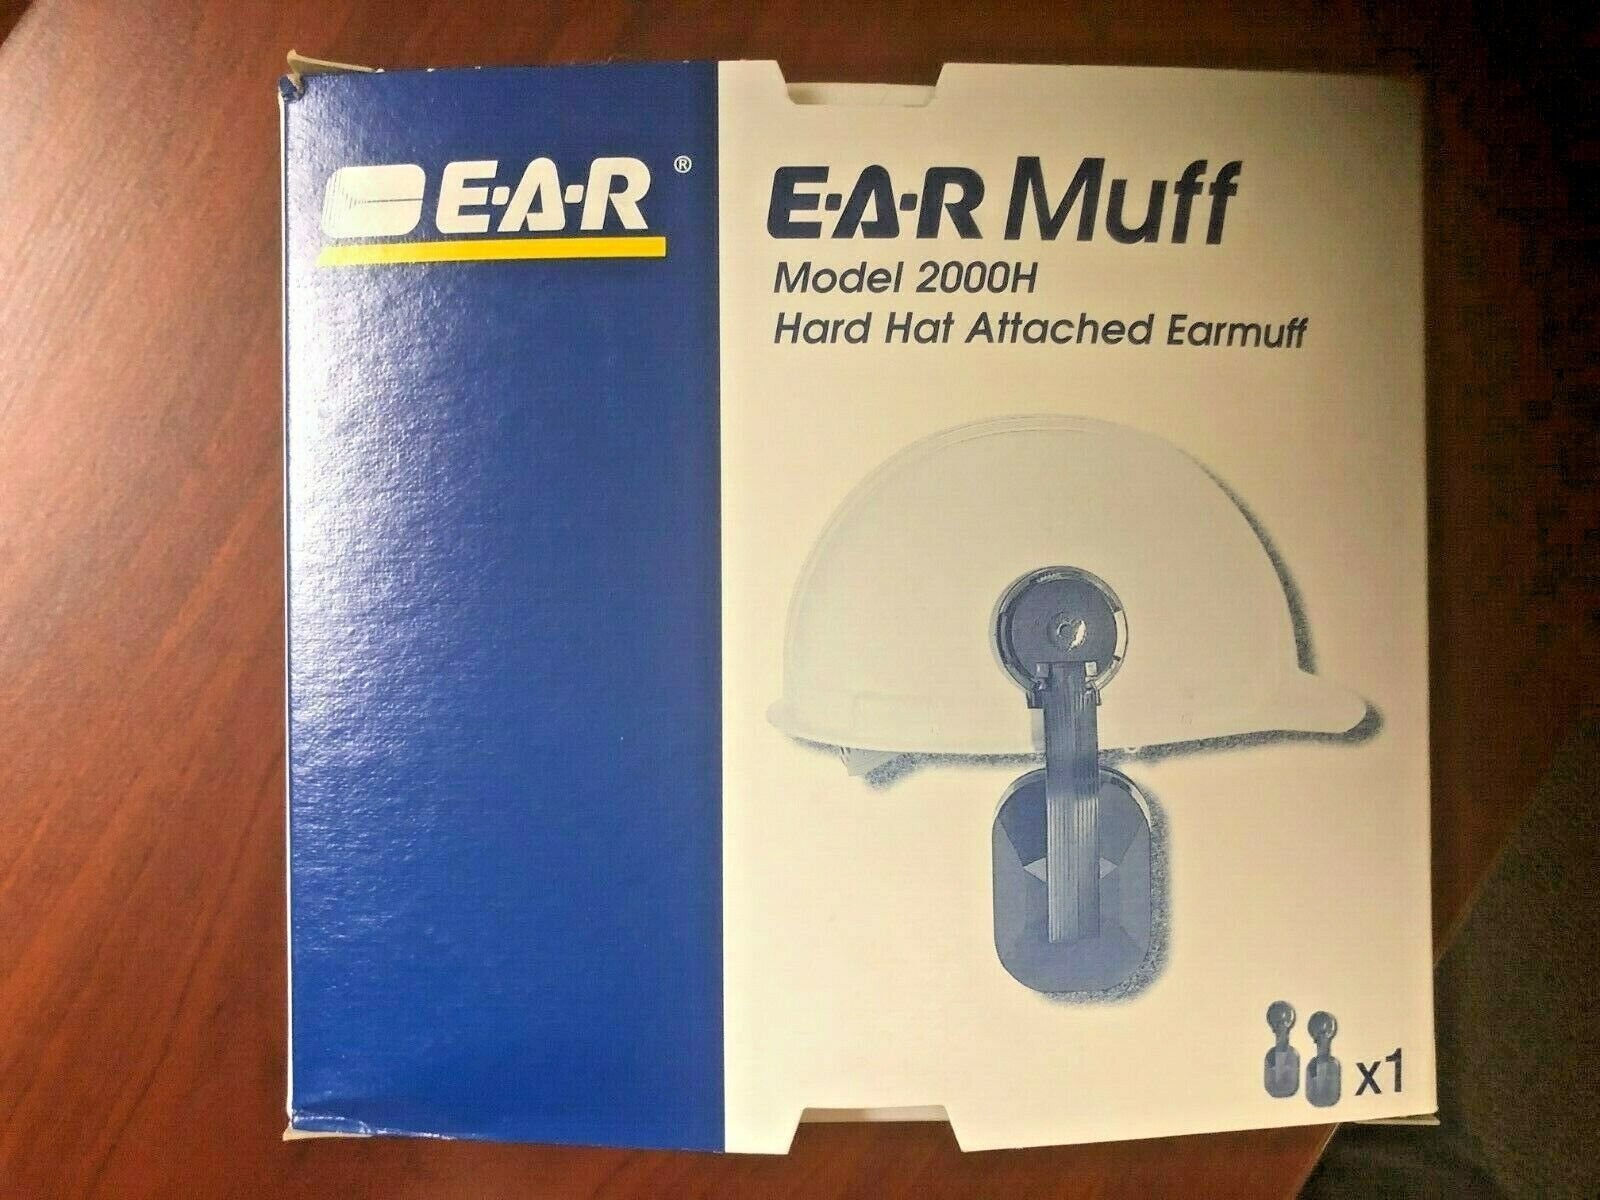 3M EAR MUFF. NEW IN BOX. 21 DECIBELS. E.A.R. ATTACHES TO HAR